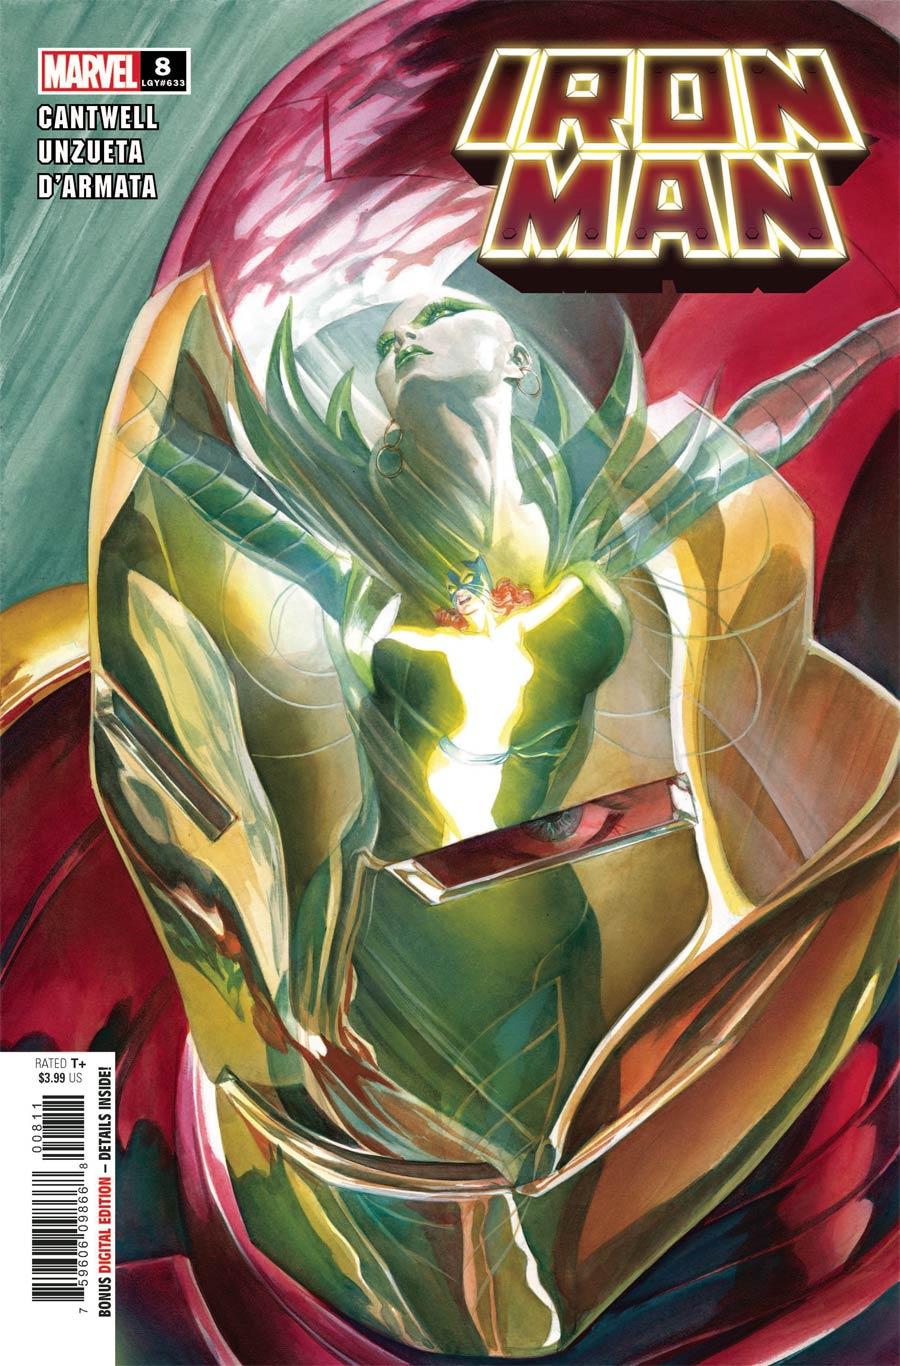 Iron Man Vol 6 #8 Cover A Regular Alex Ross Cover